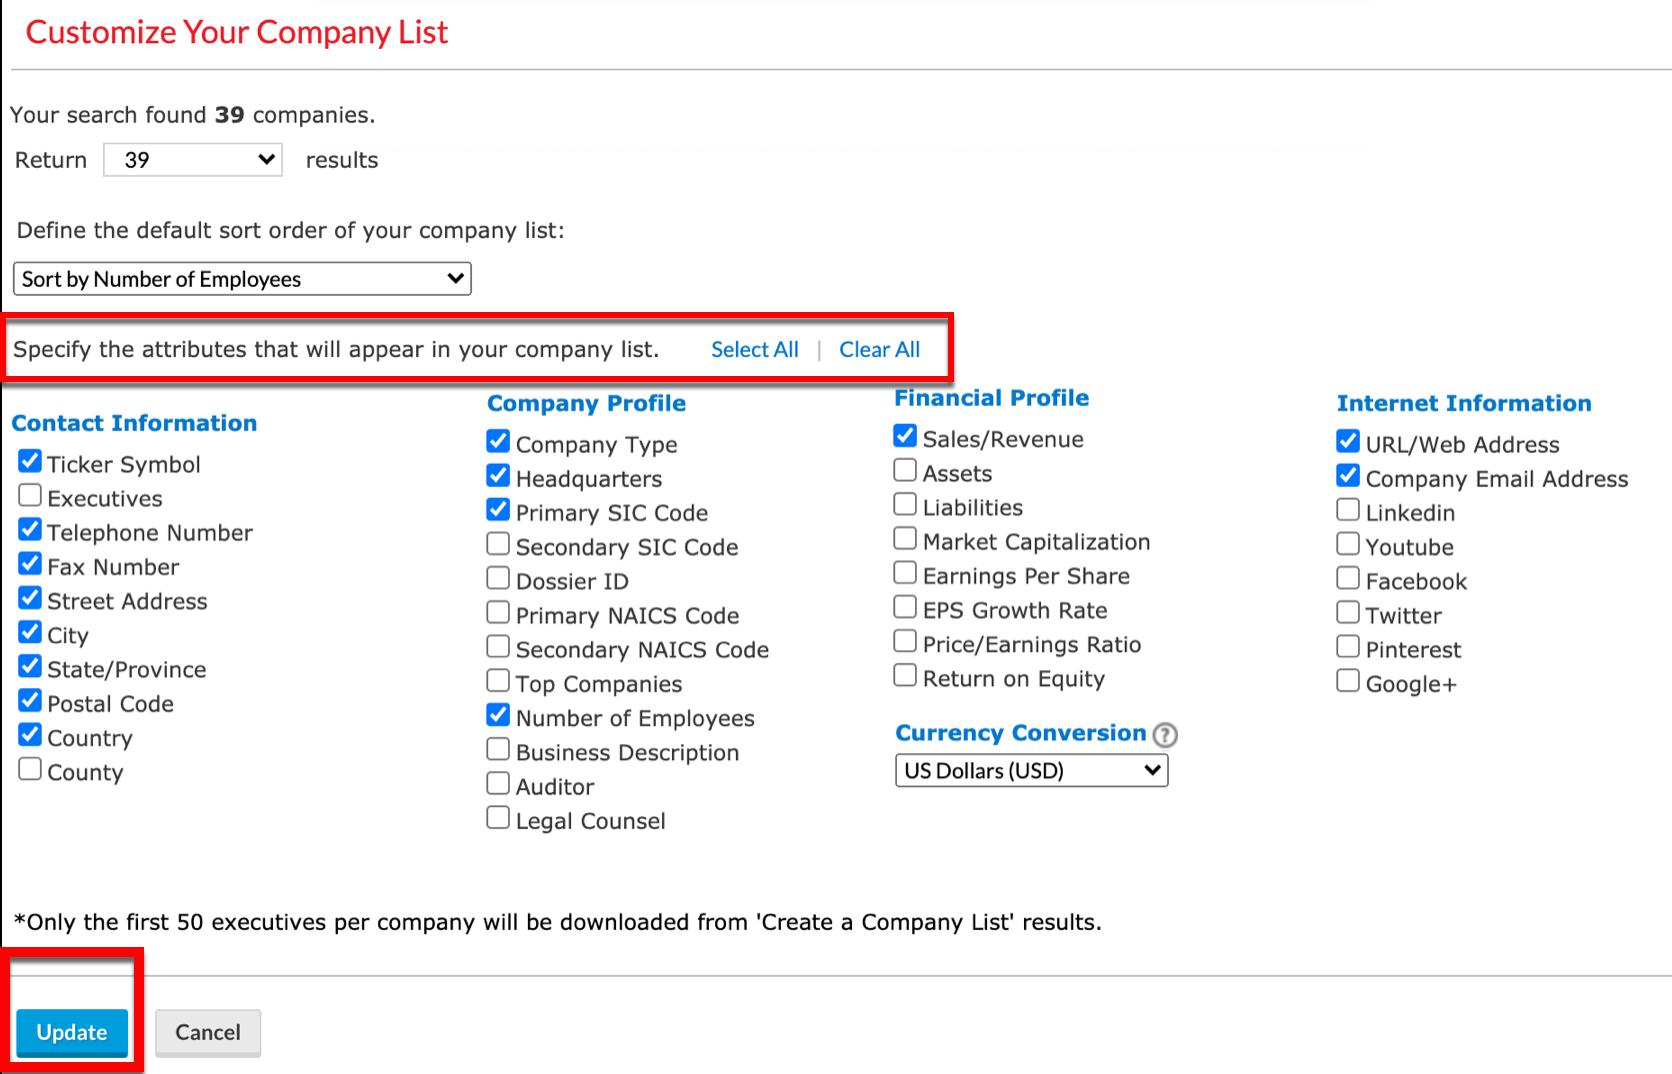 Nexis Uni Customize Your Company List screen